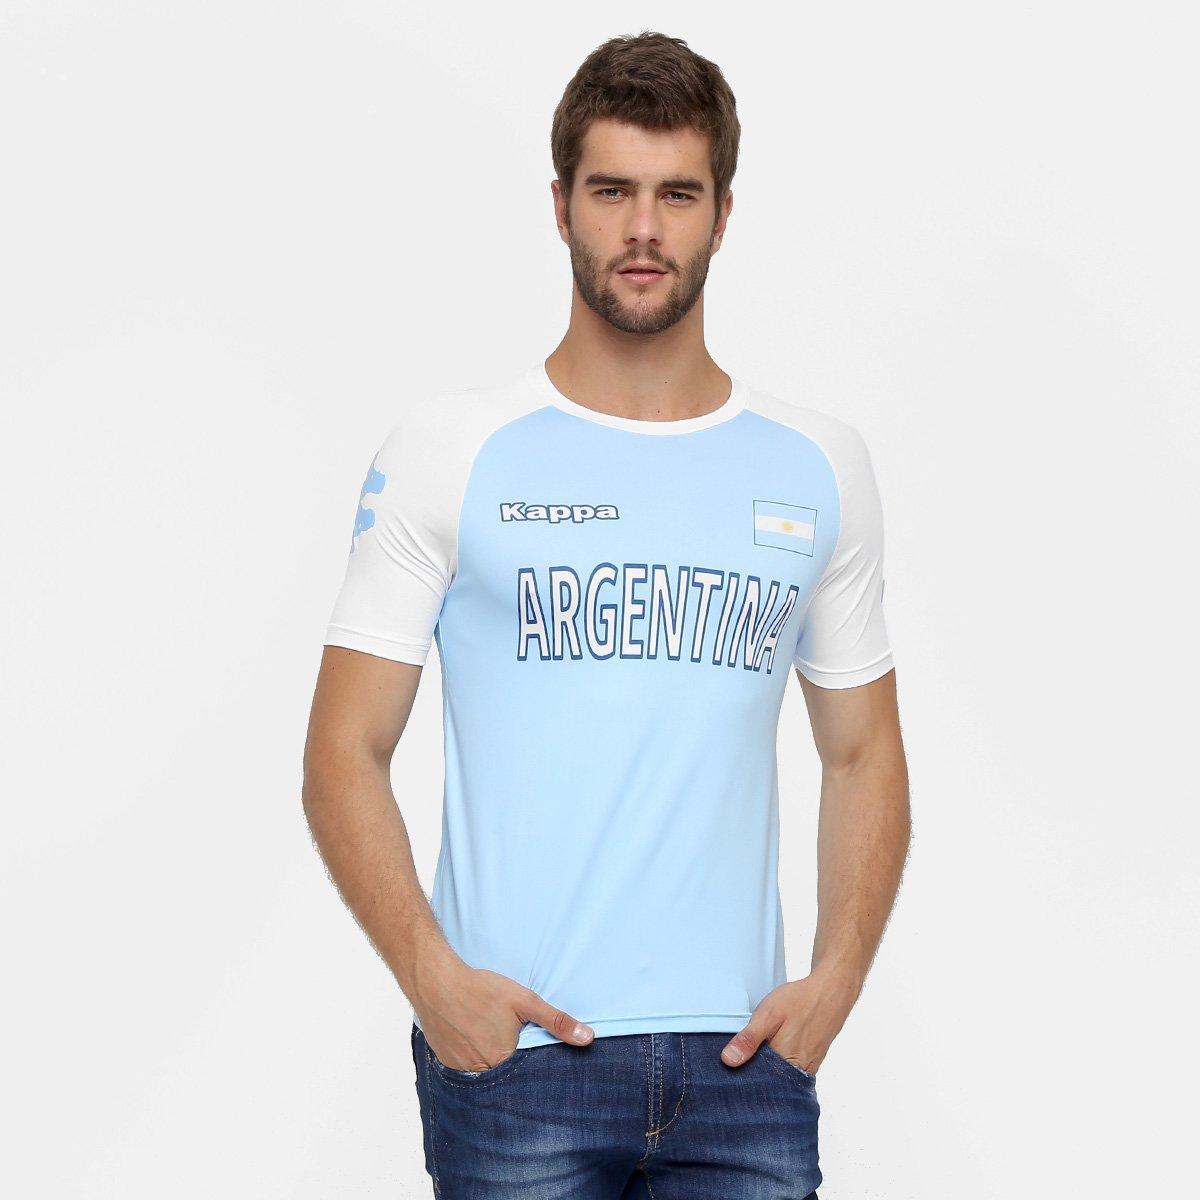 Camiseta Argentina Kappa Kombat Masculina | Kappa